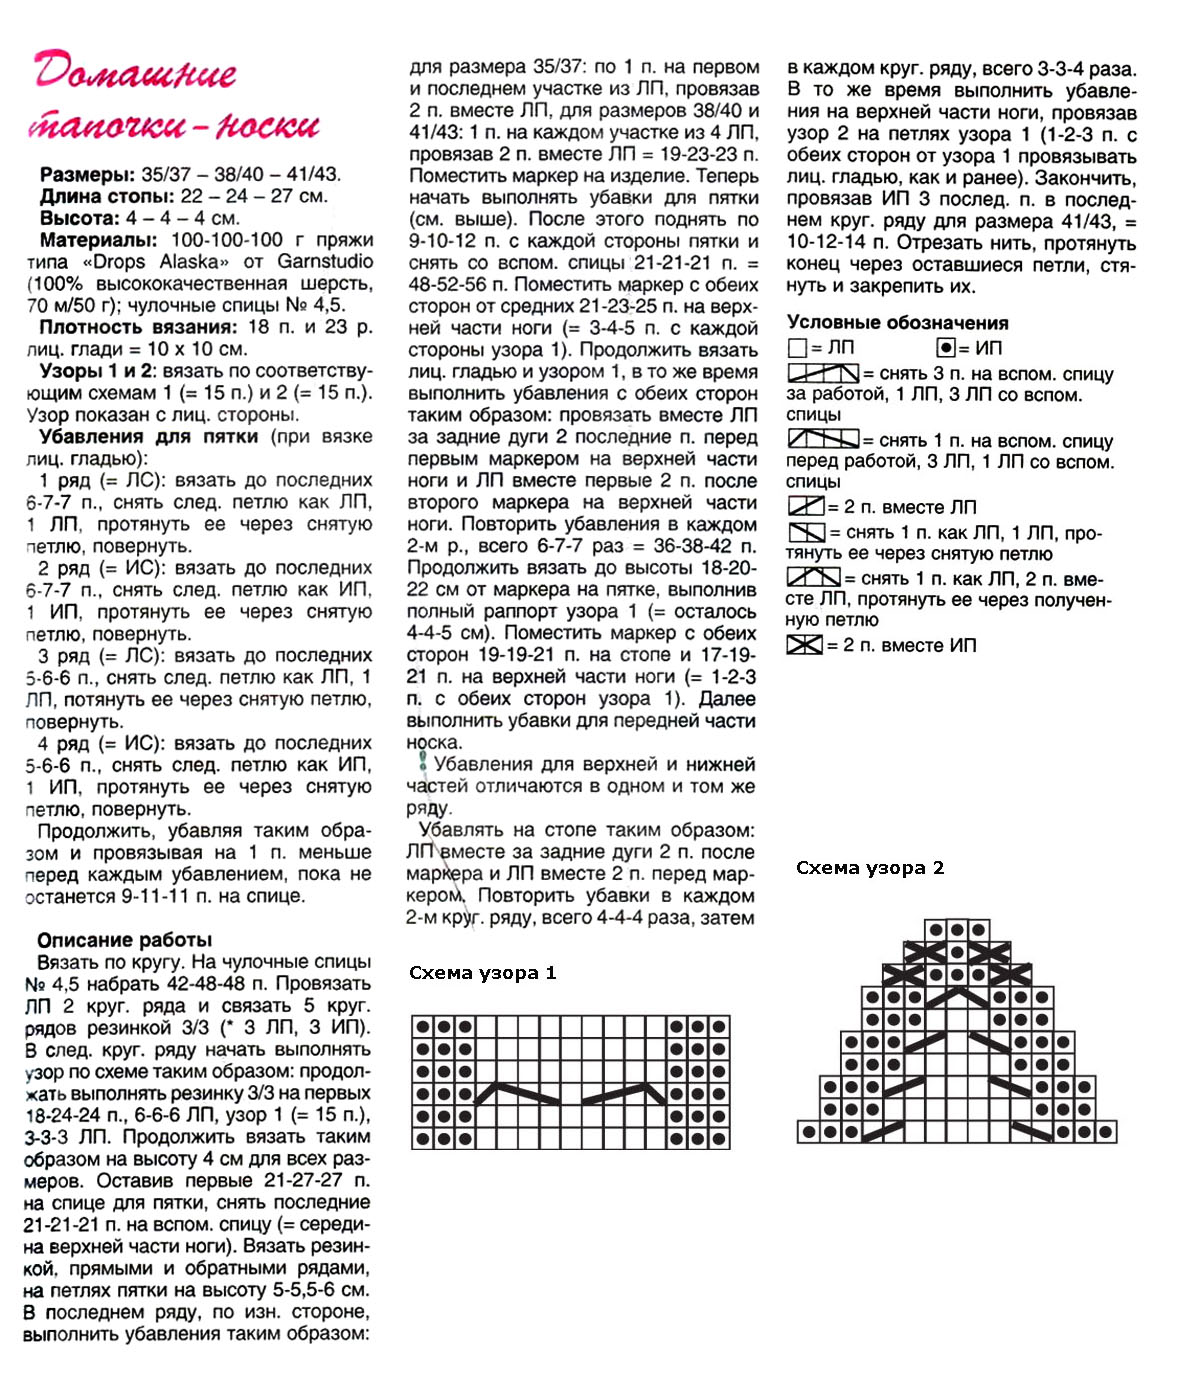 Следки двумя спицами схема и описание фото